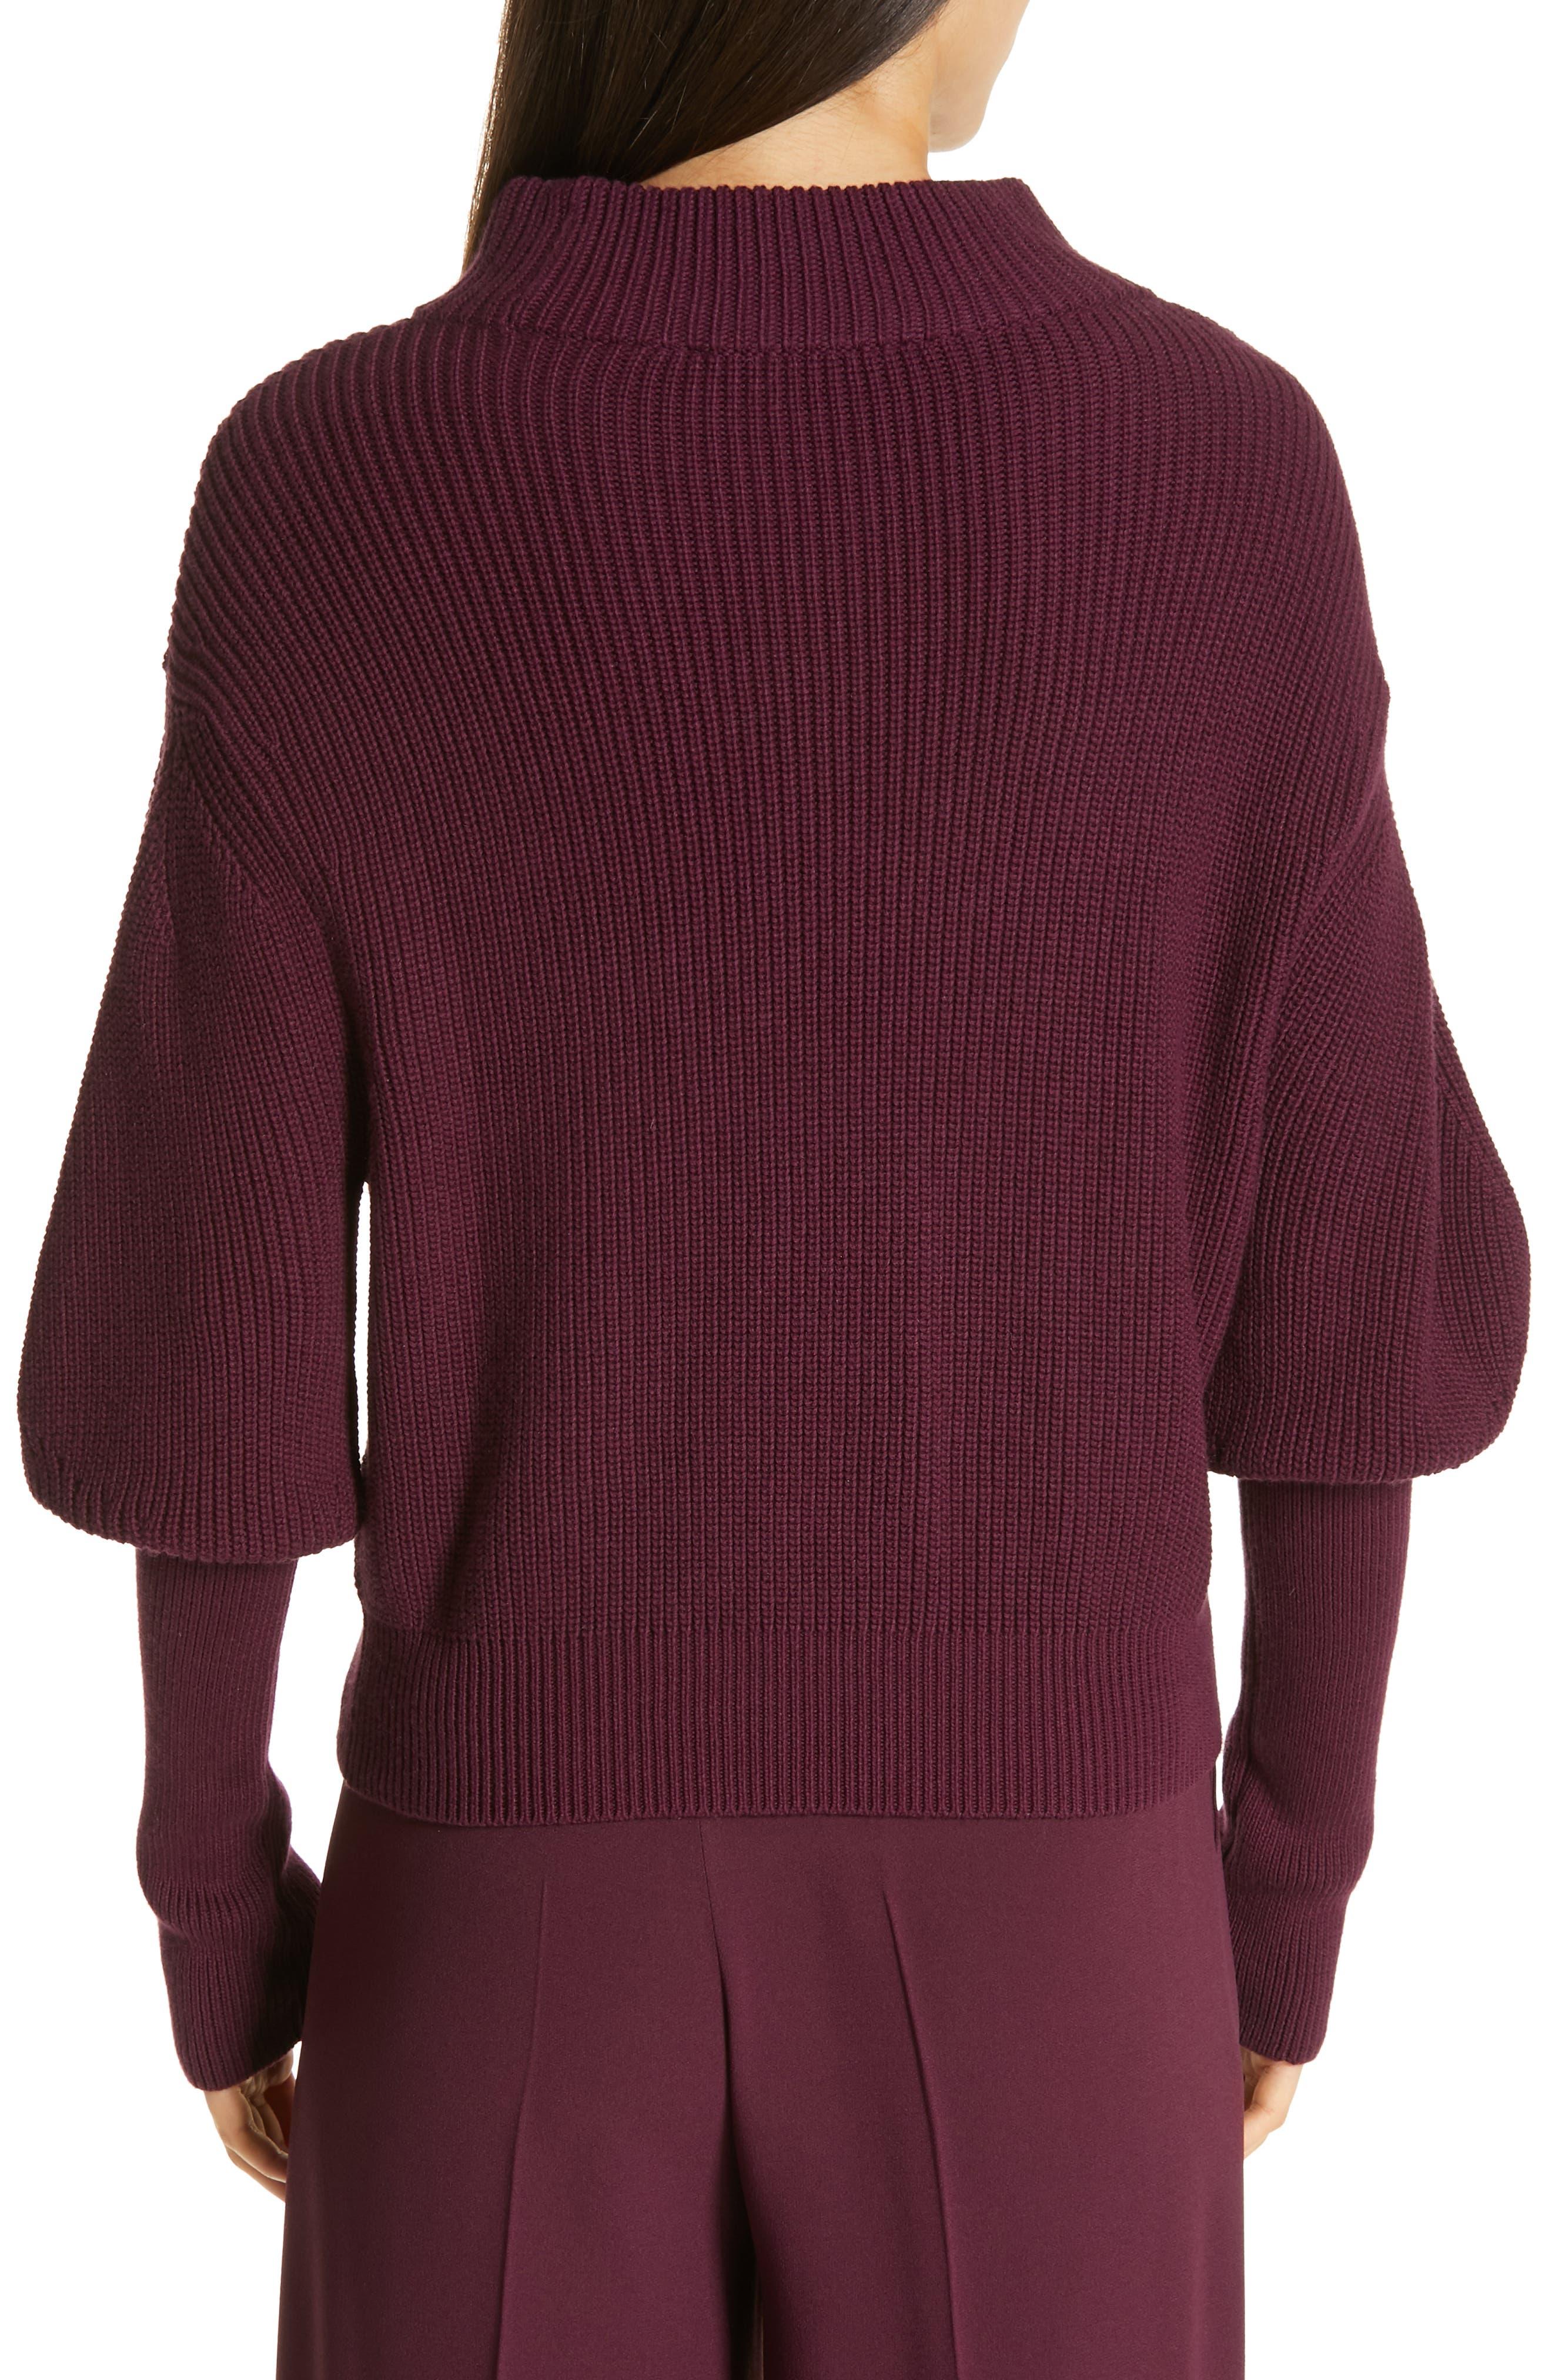 Flix Balloon Sleeve Sweater,                             Alternate thumbnail 2, color,                             DARK BERRY